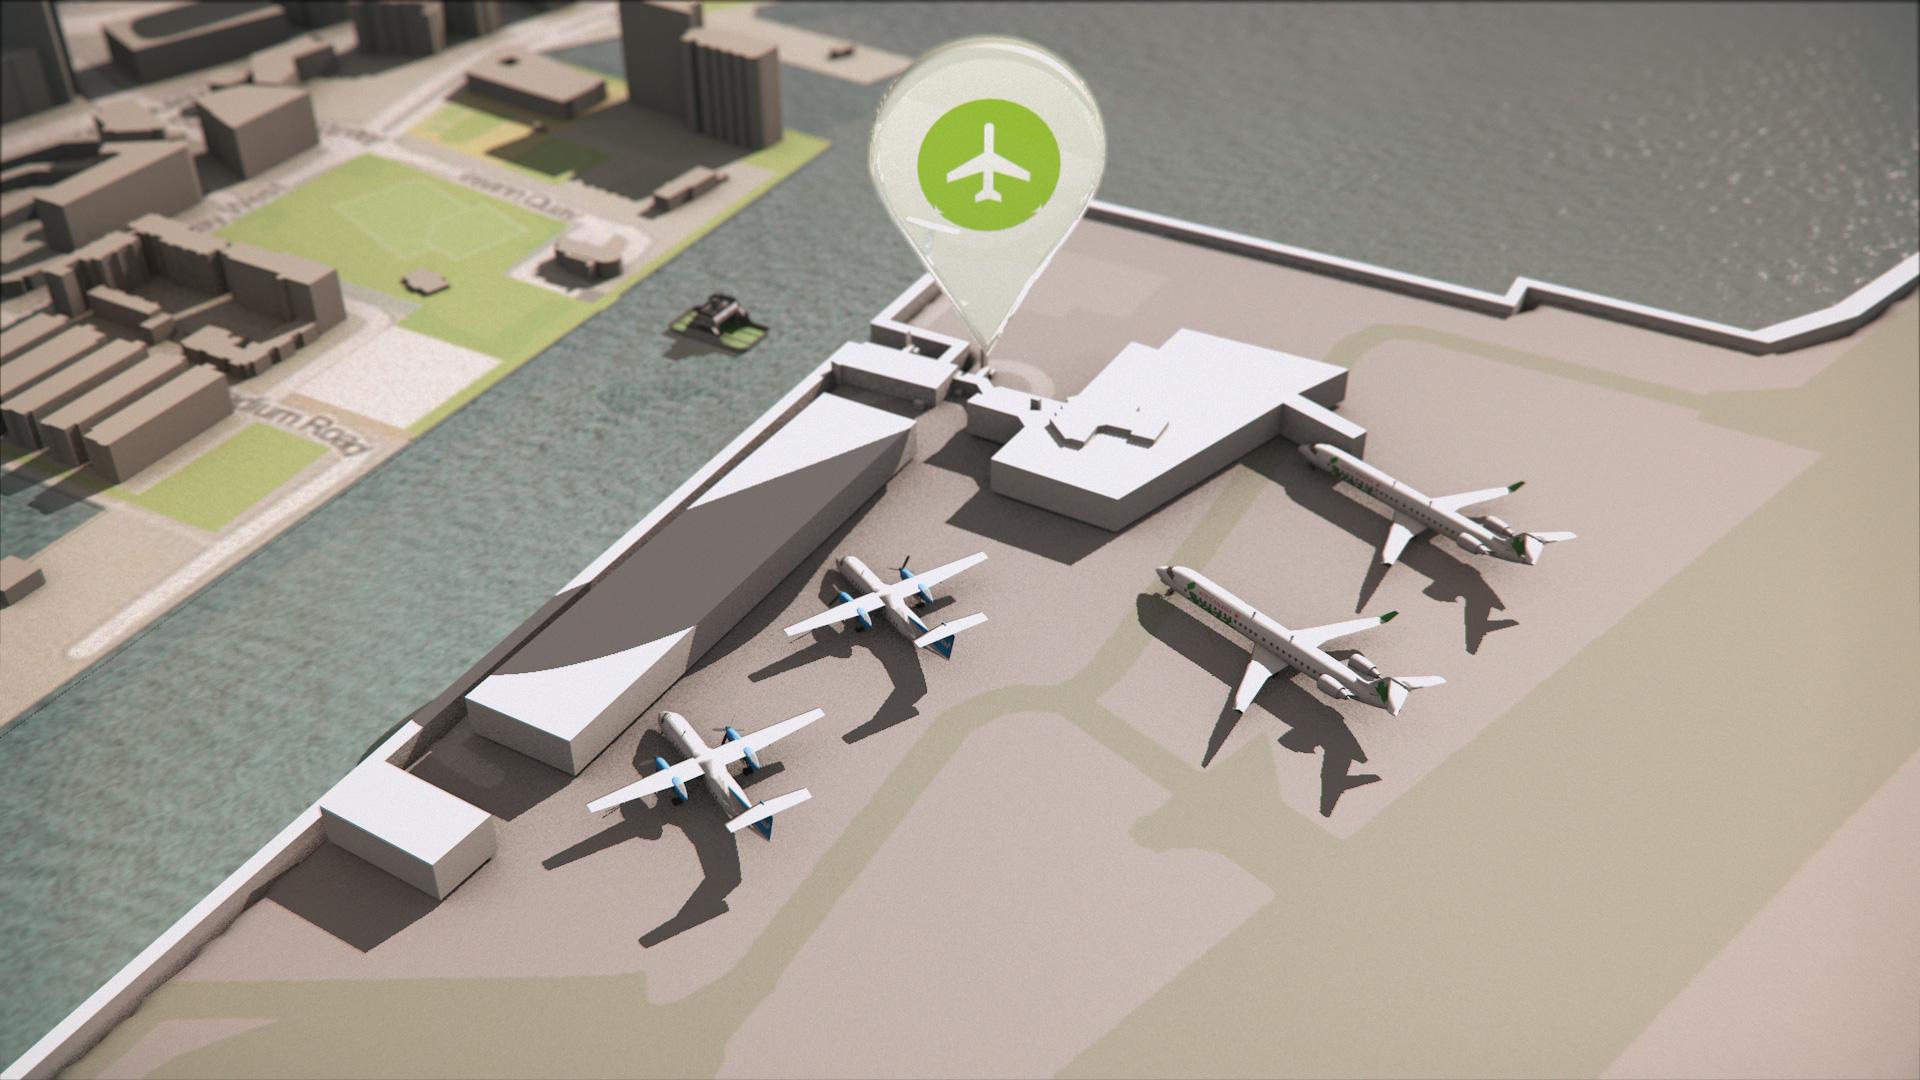 CONCEPT 3 AIRPORT CLOSEUP.jpg